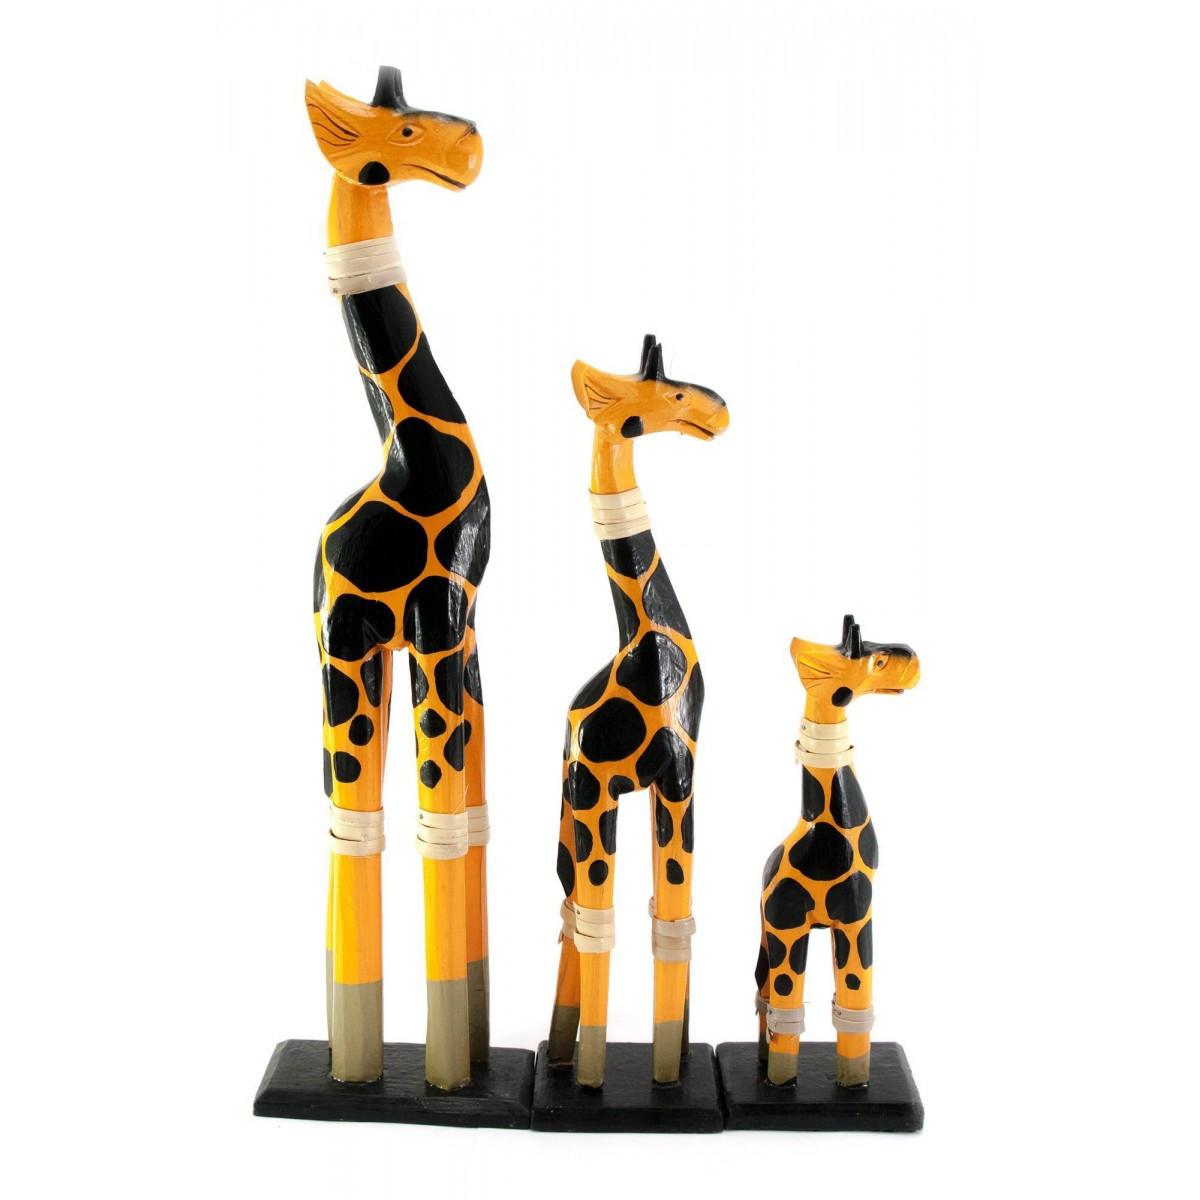 Жирафы 3 шт деревянные 40х11х5,5 см 29,5х8х5,5 см 19,5х8х6 см 29919